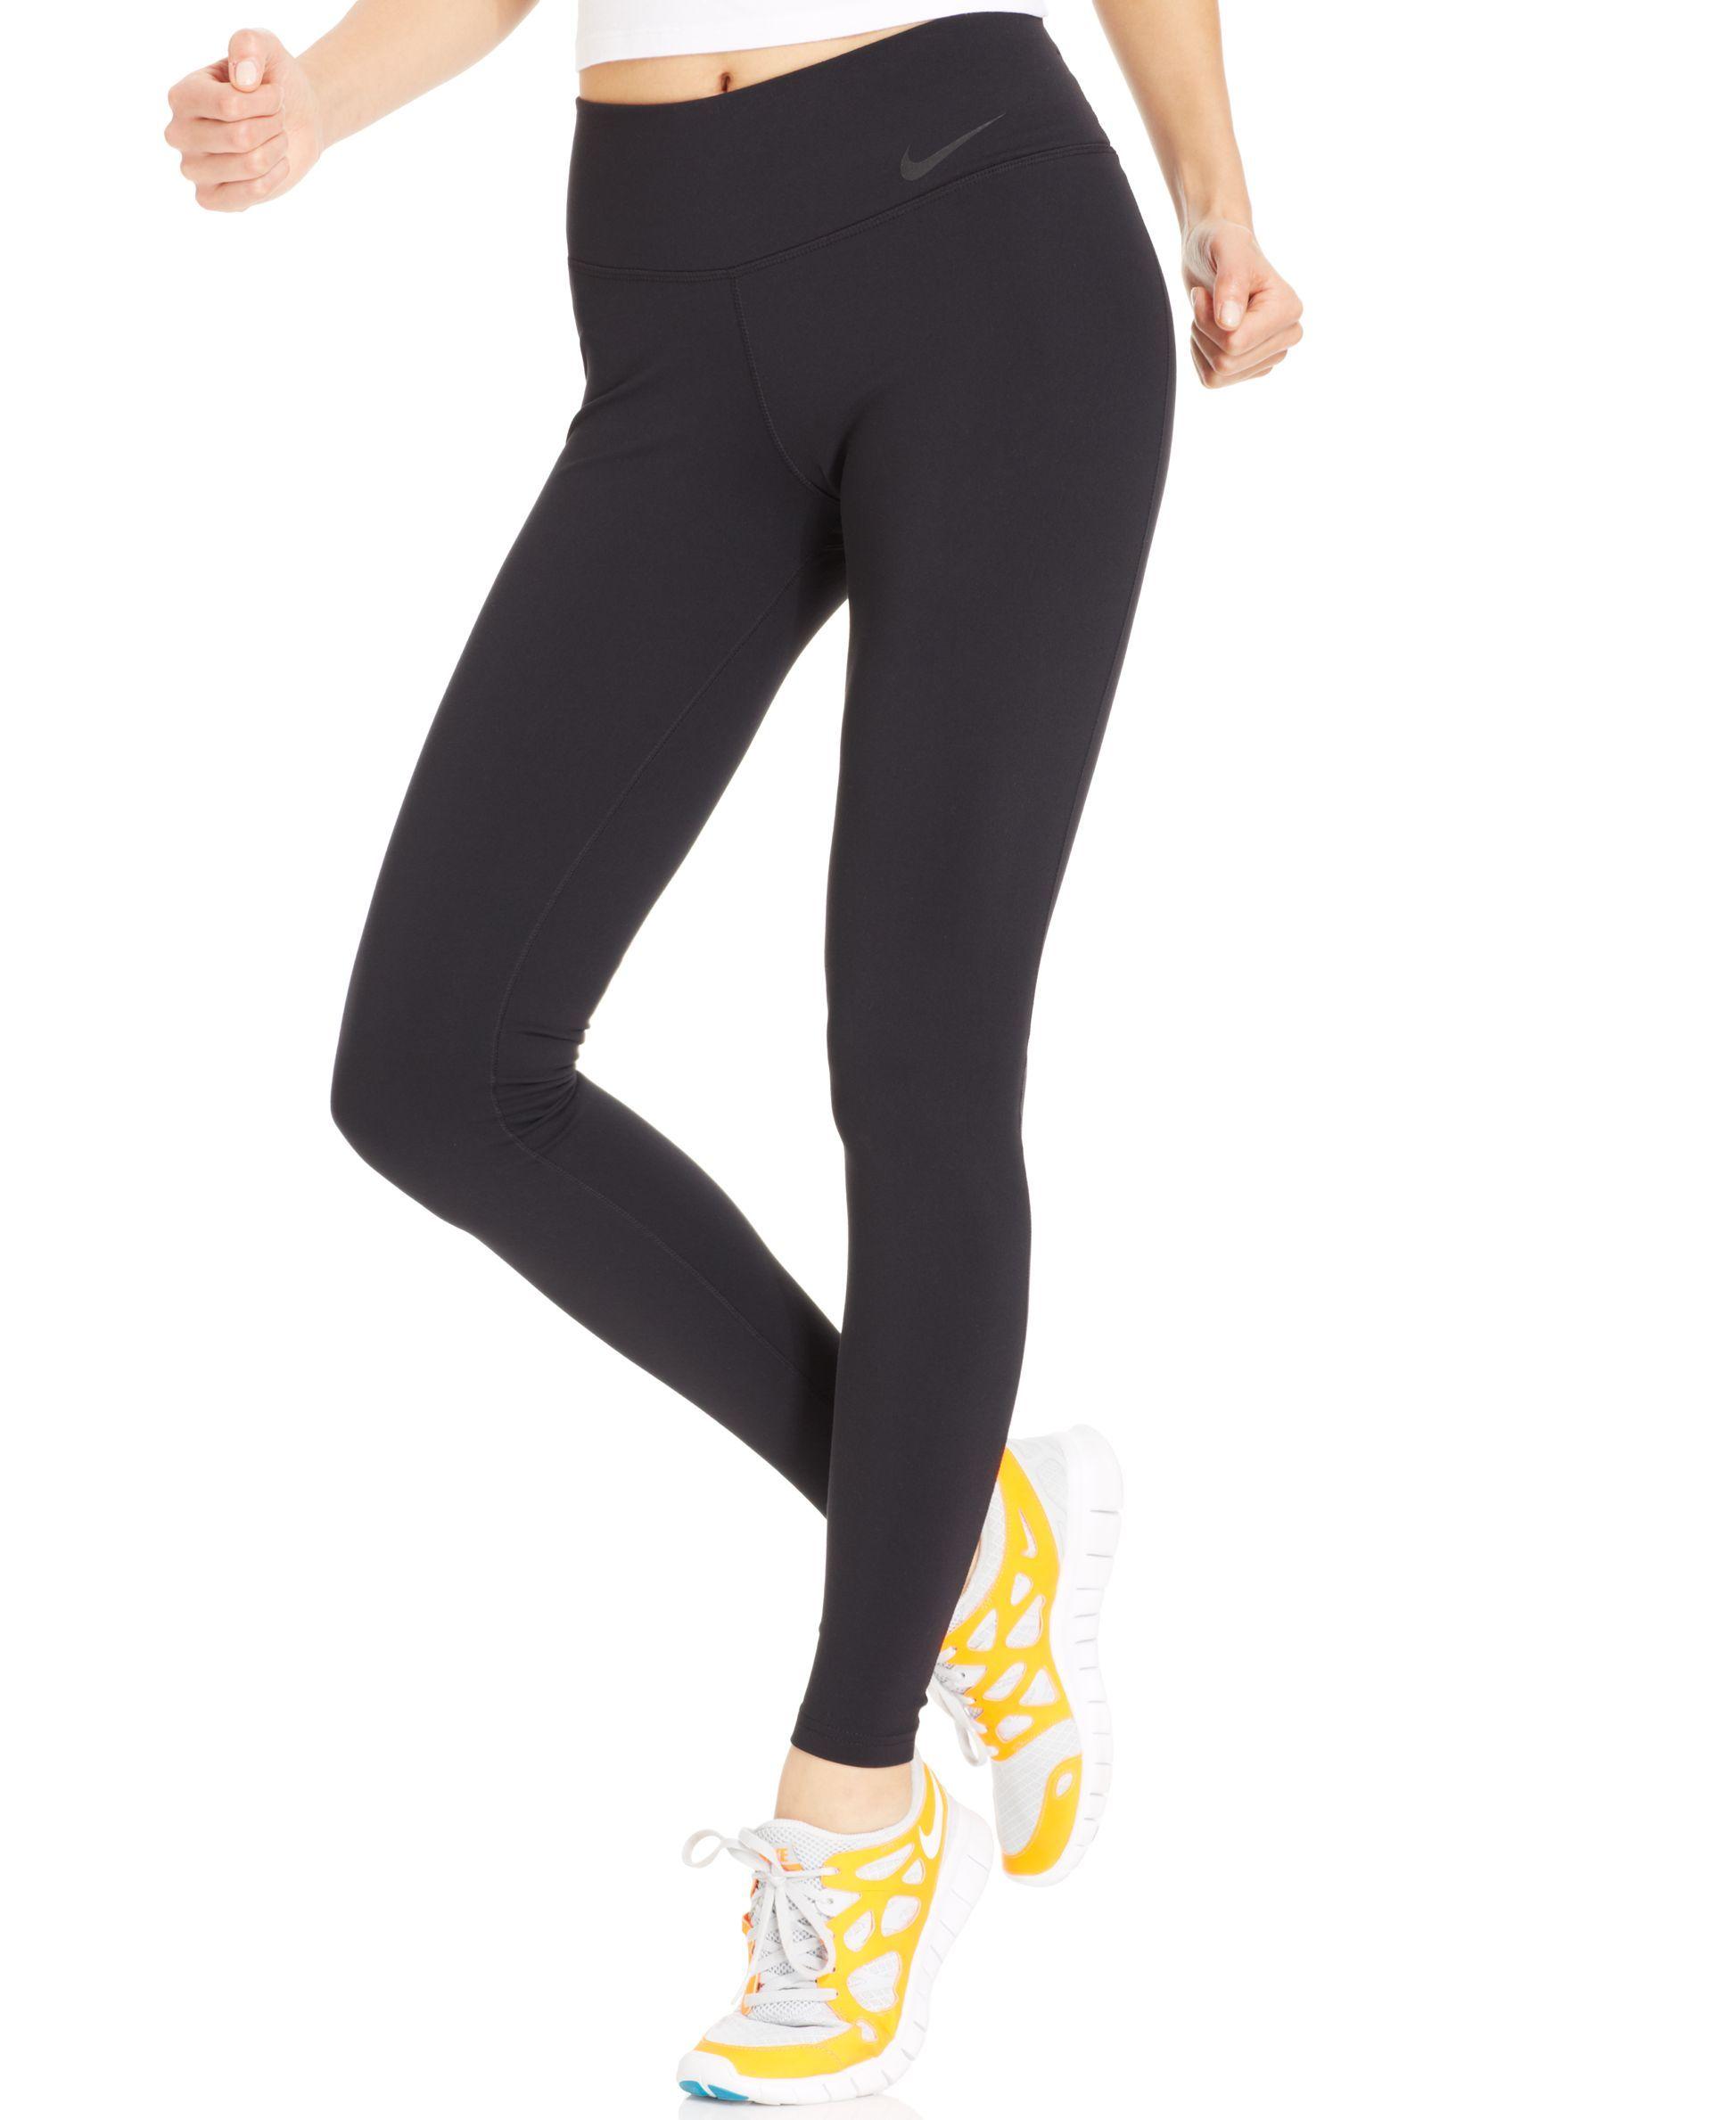 6f288aec2f Nike Legendary Dri-FIT Leggings - Nike - Women - Macy s